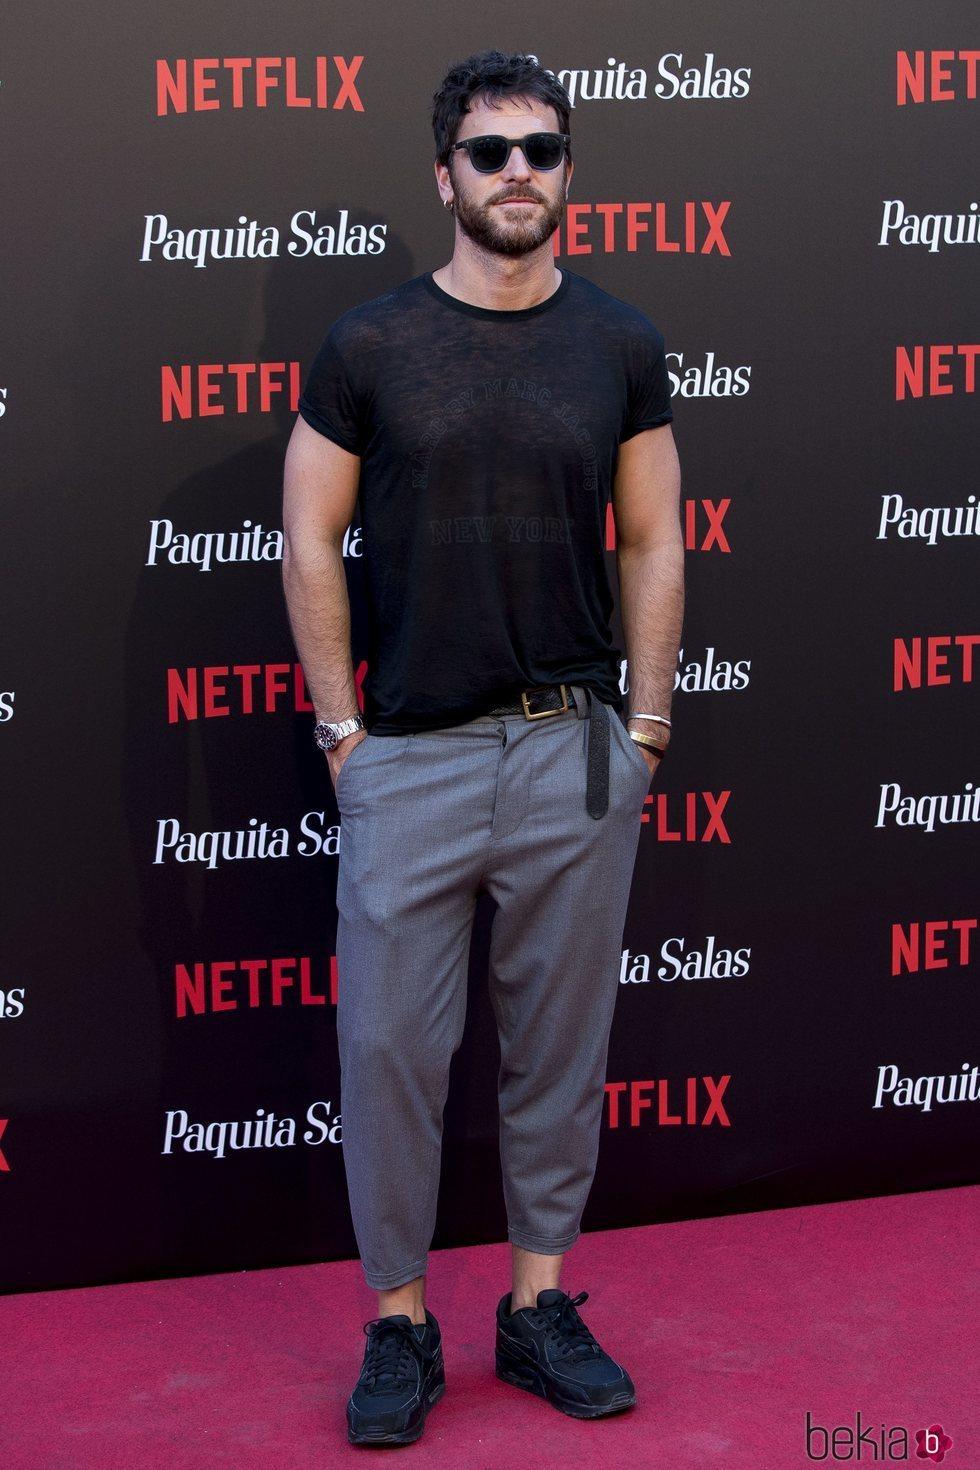 Alfonso Bassave en la premiere de la segunda temporada de 'Paquita Salas'